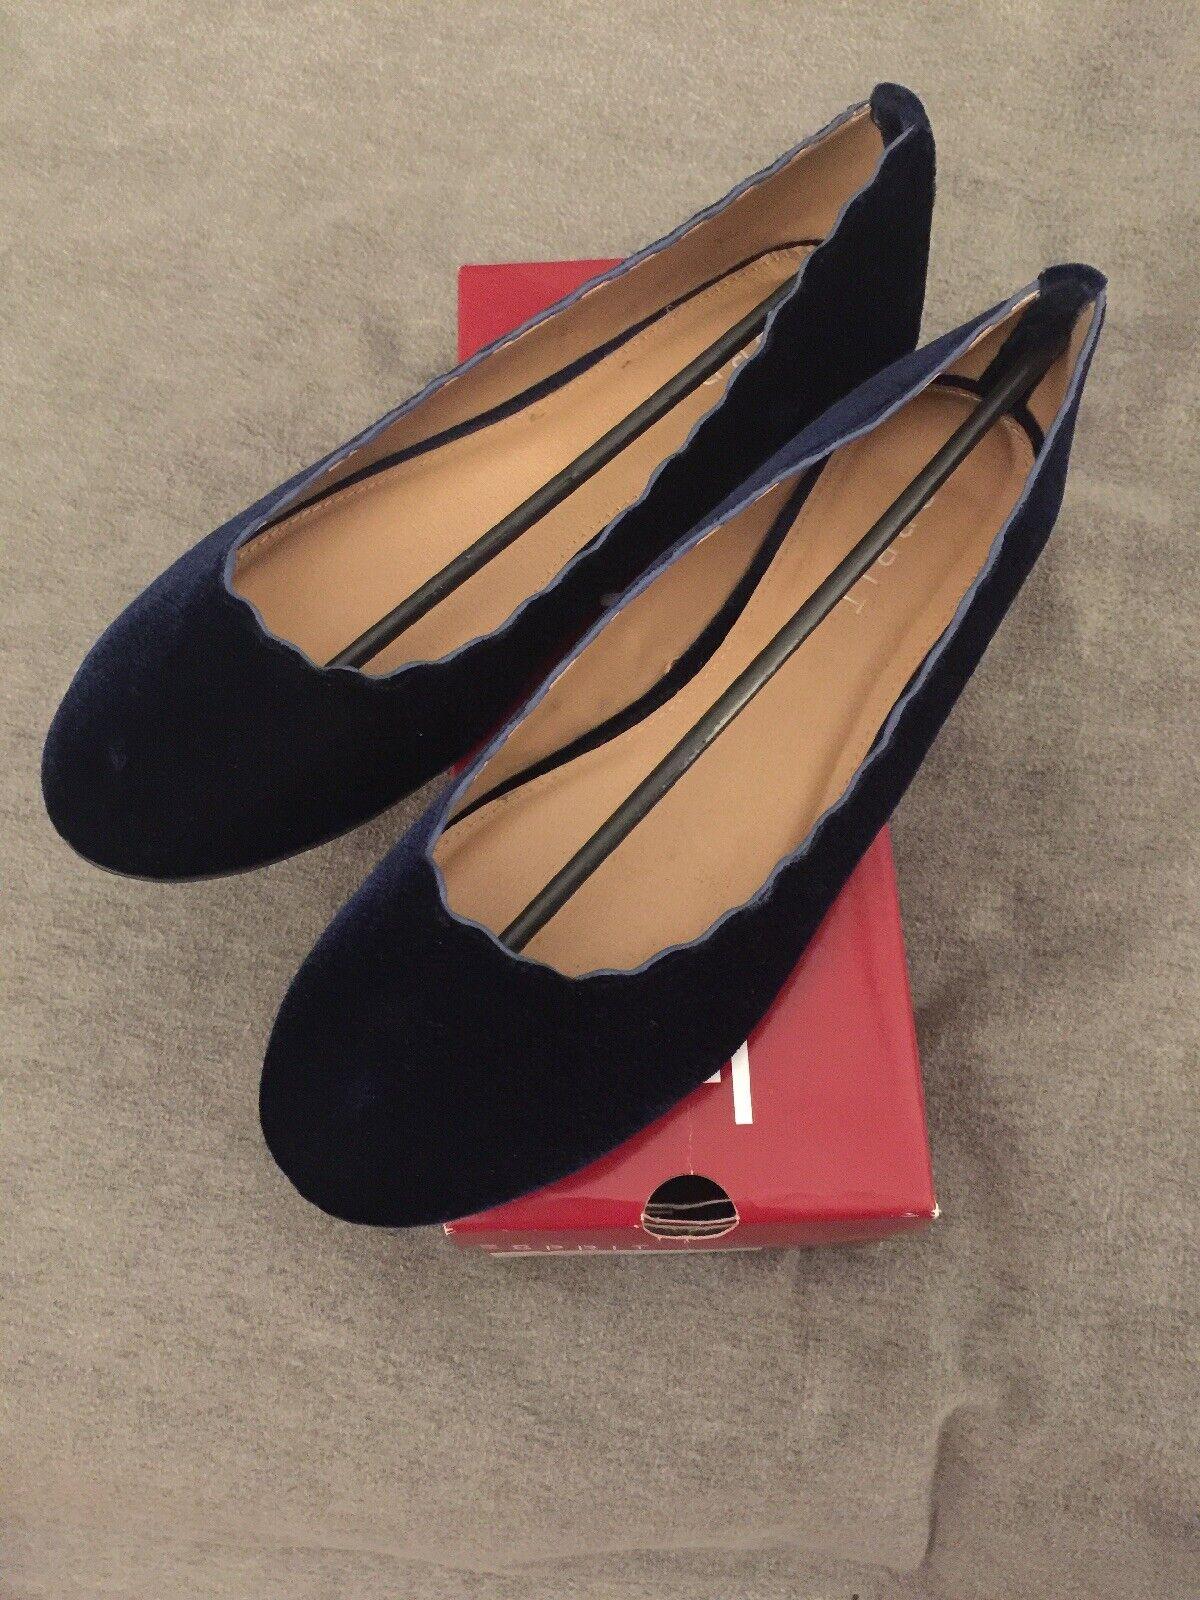 Esprit bluee Odette Flats, Size 11